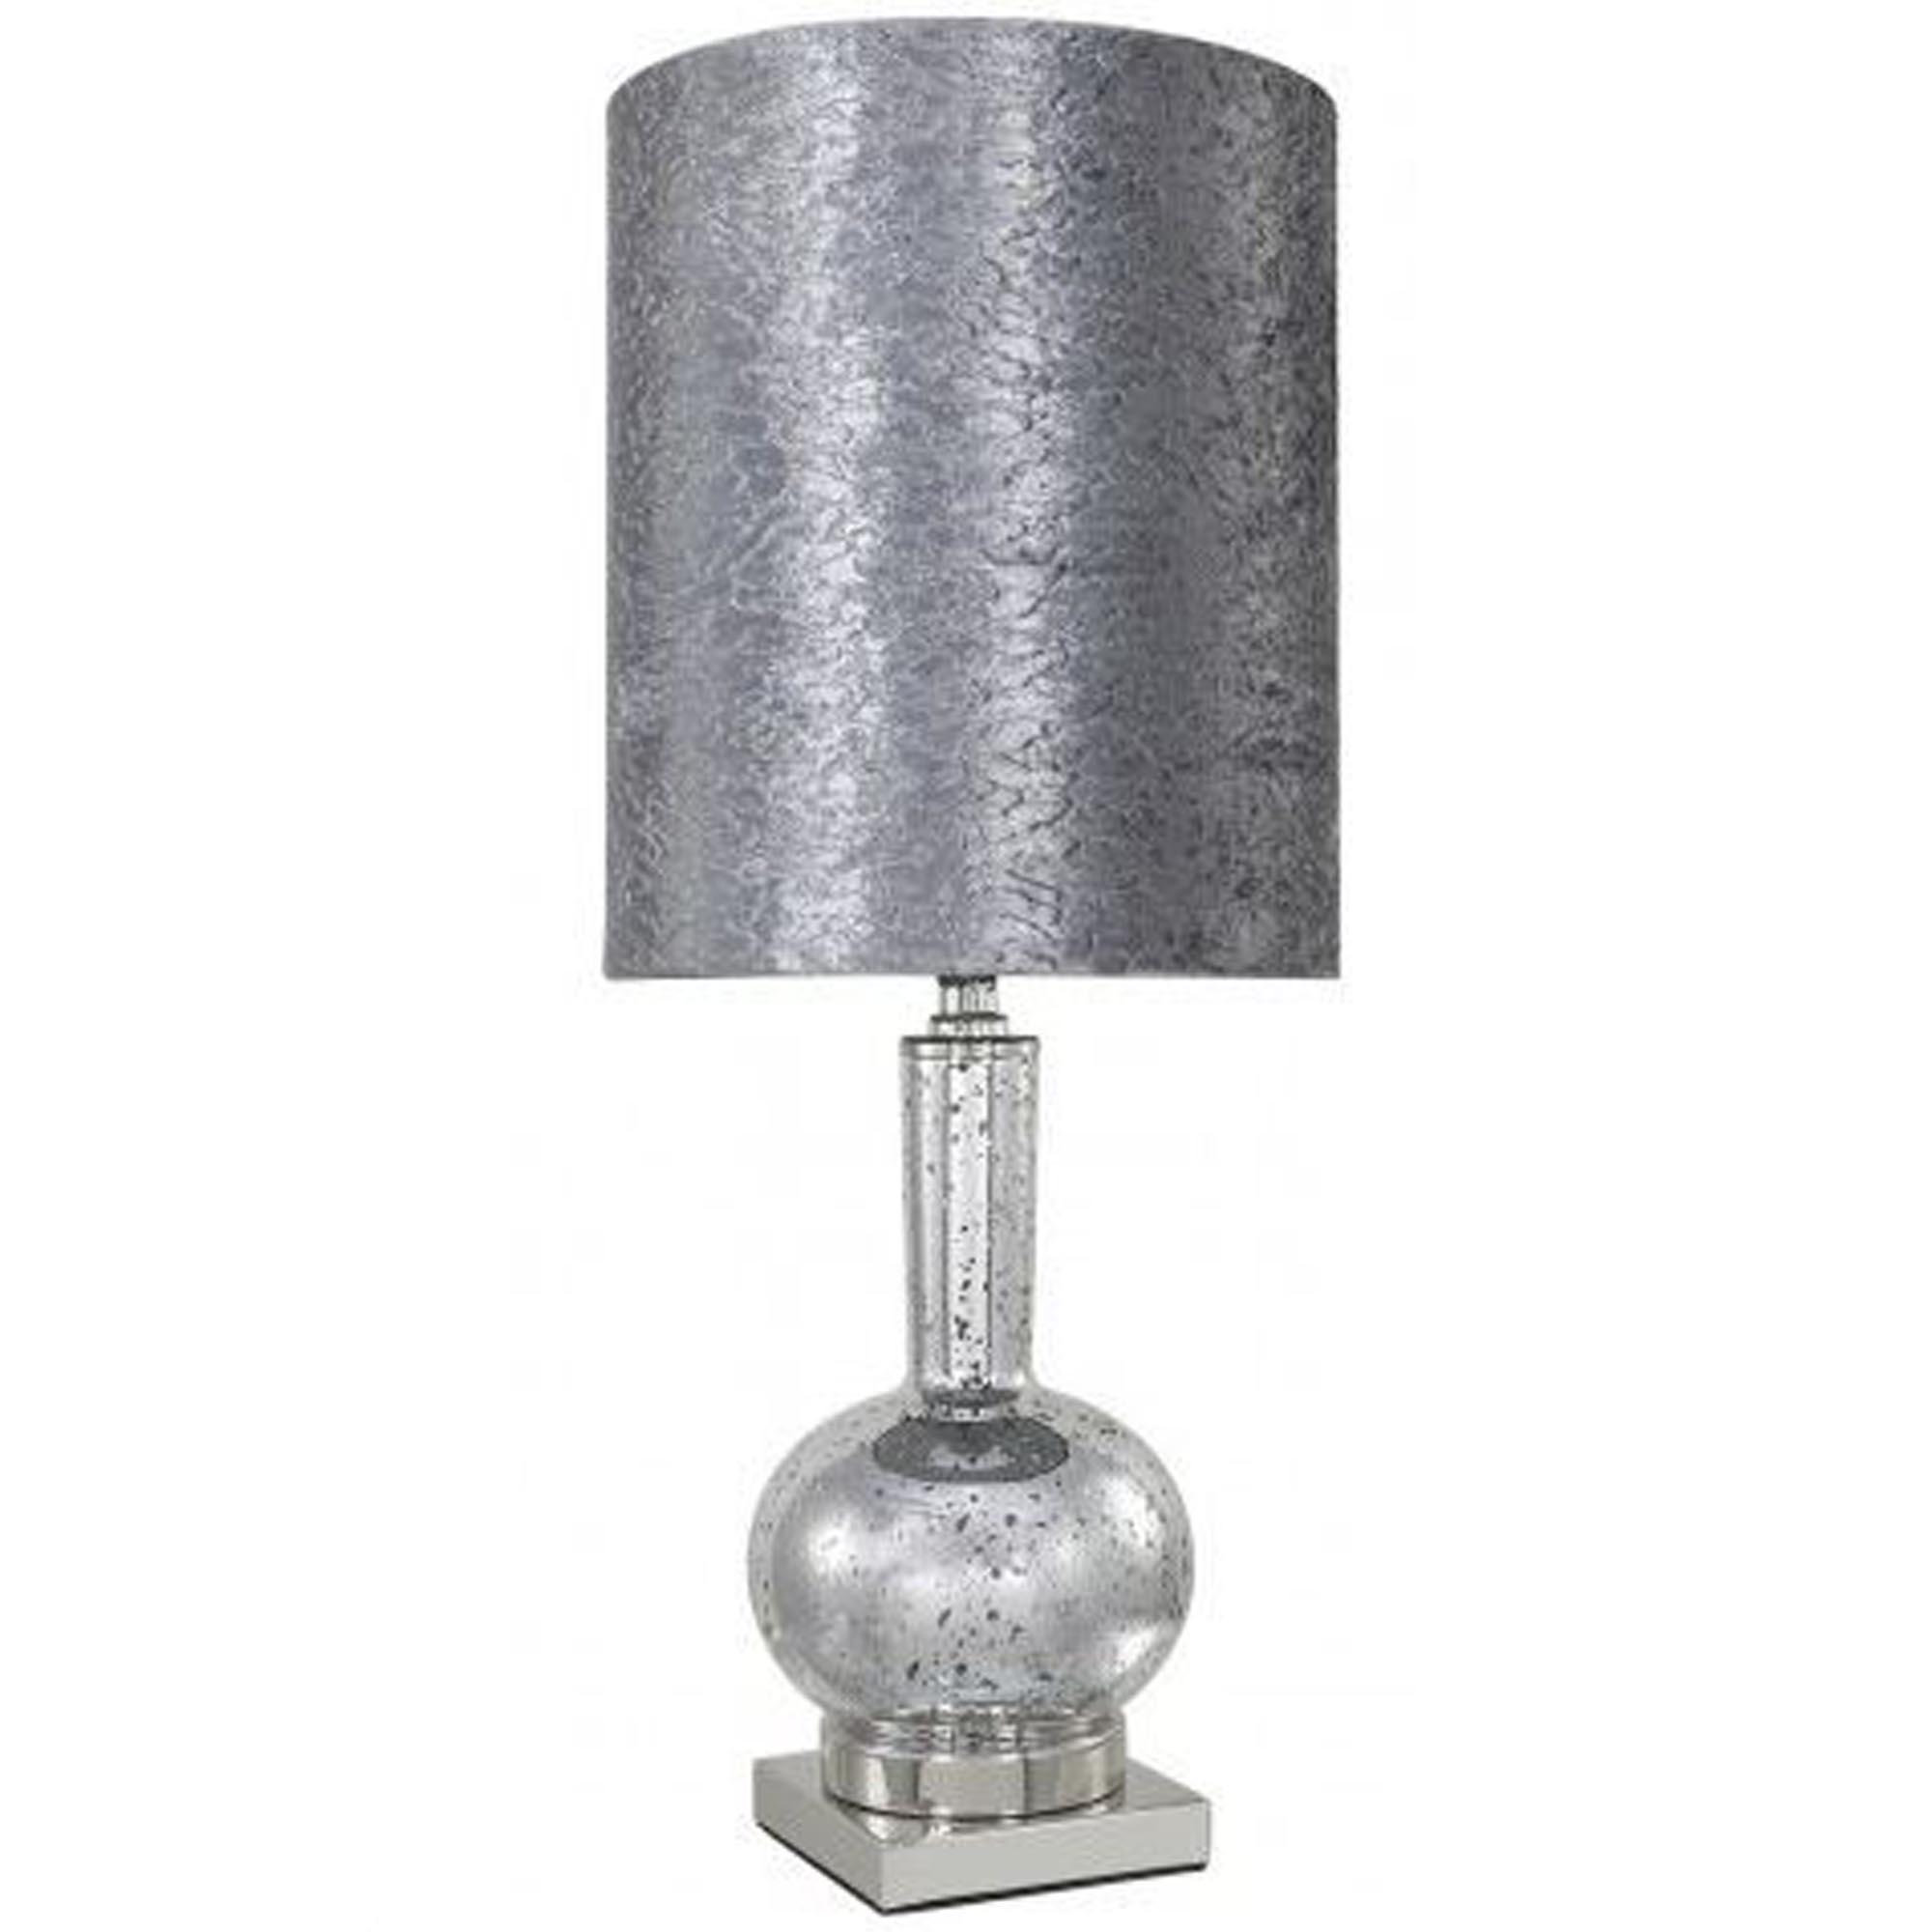 antique marvelous fixtures unique lights drum inspiring pendant glass geometeric mercury light